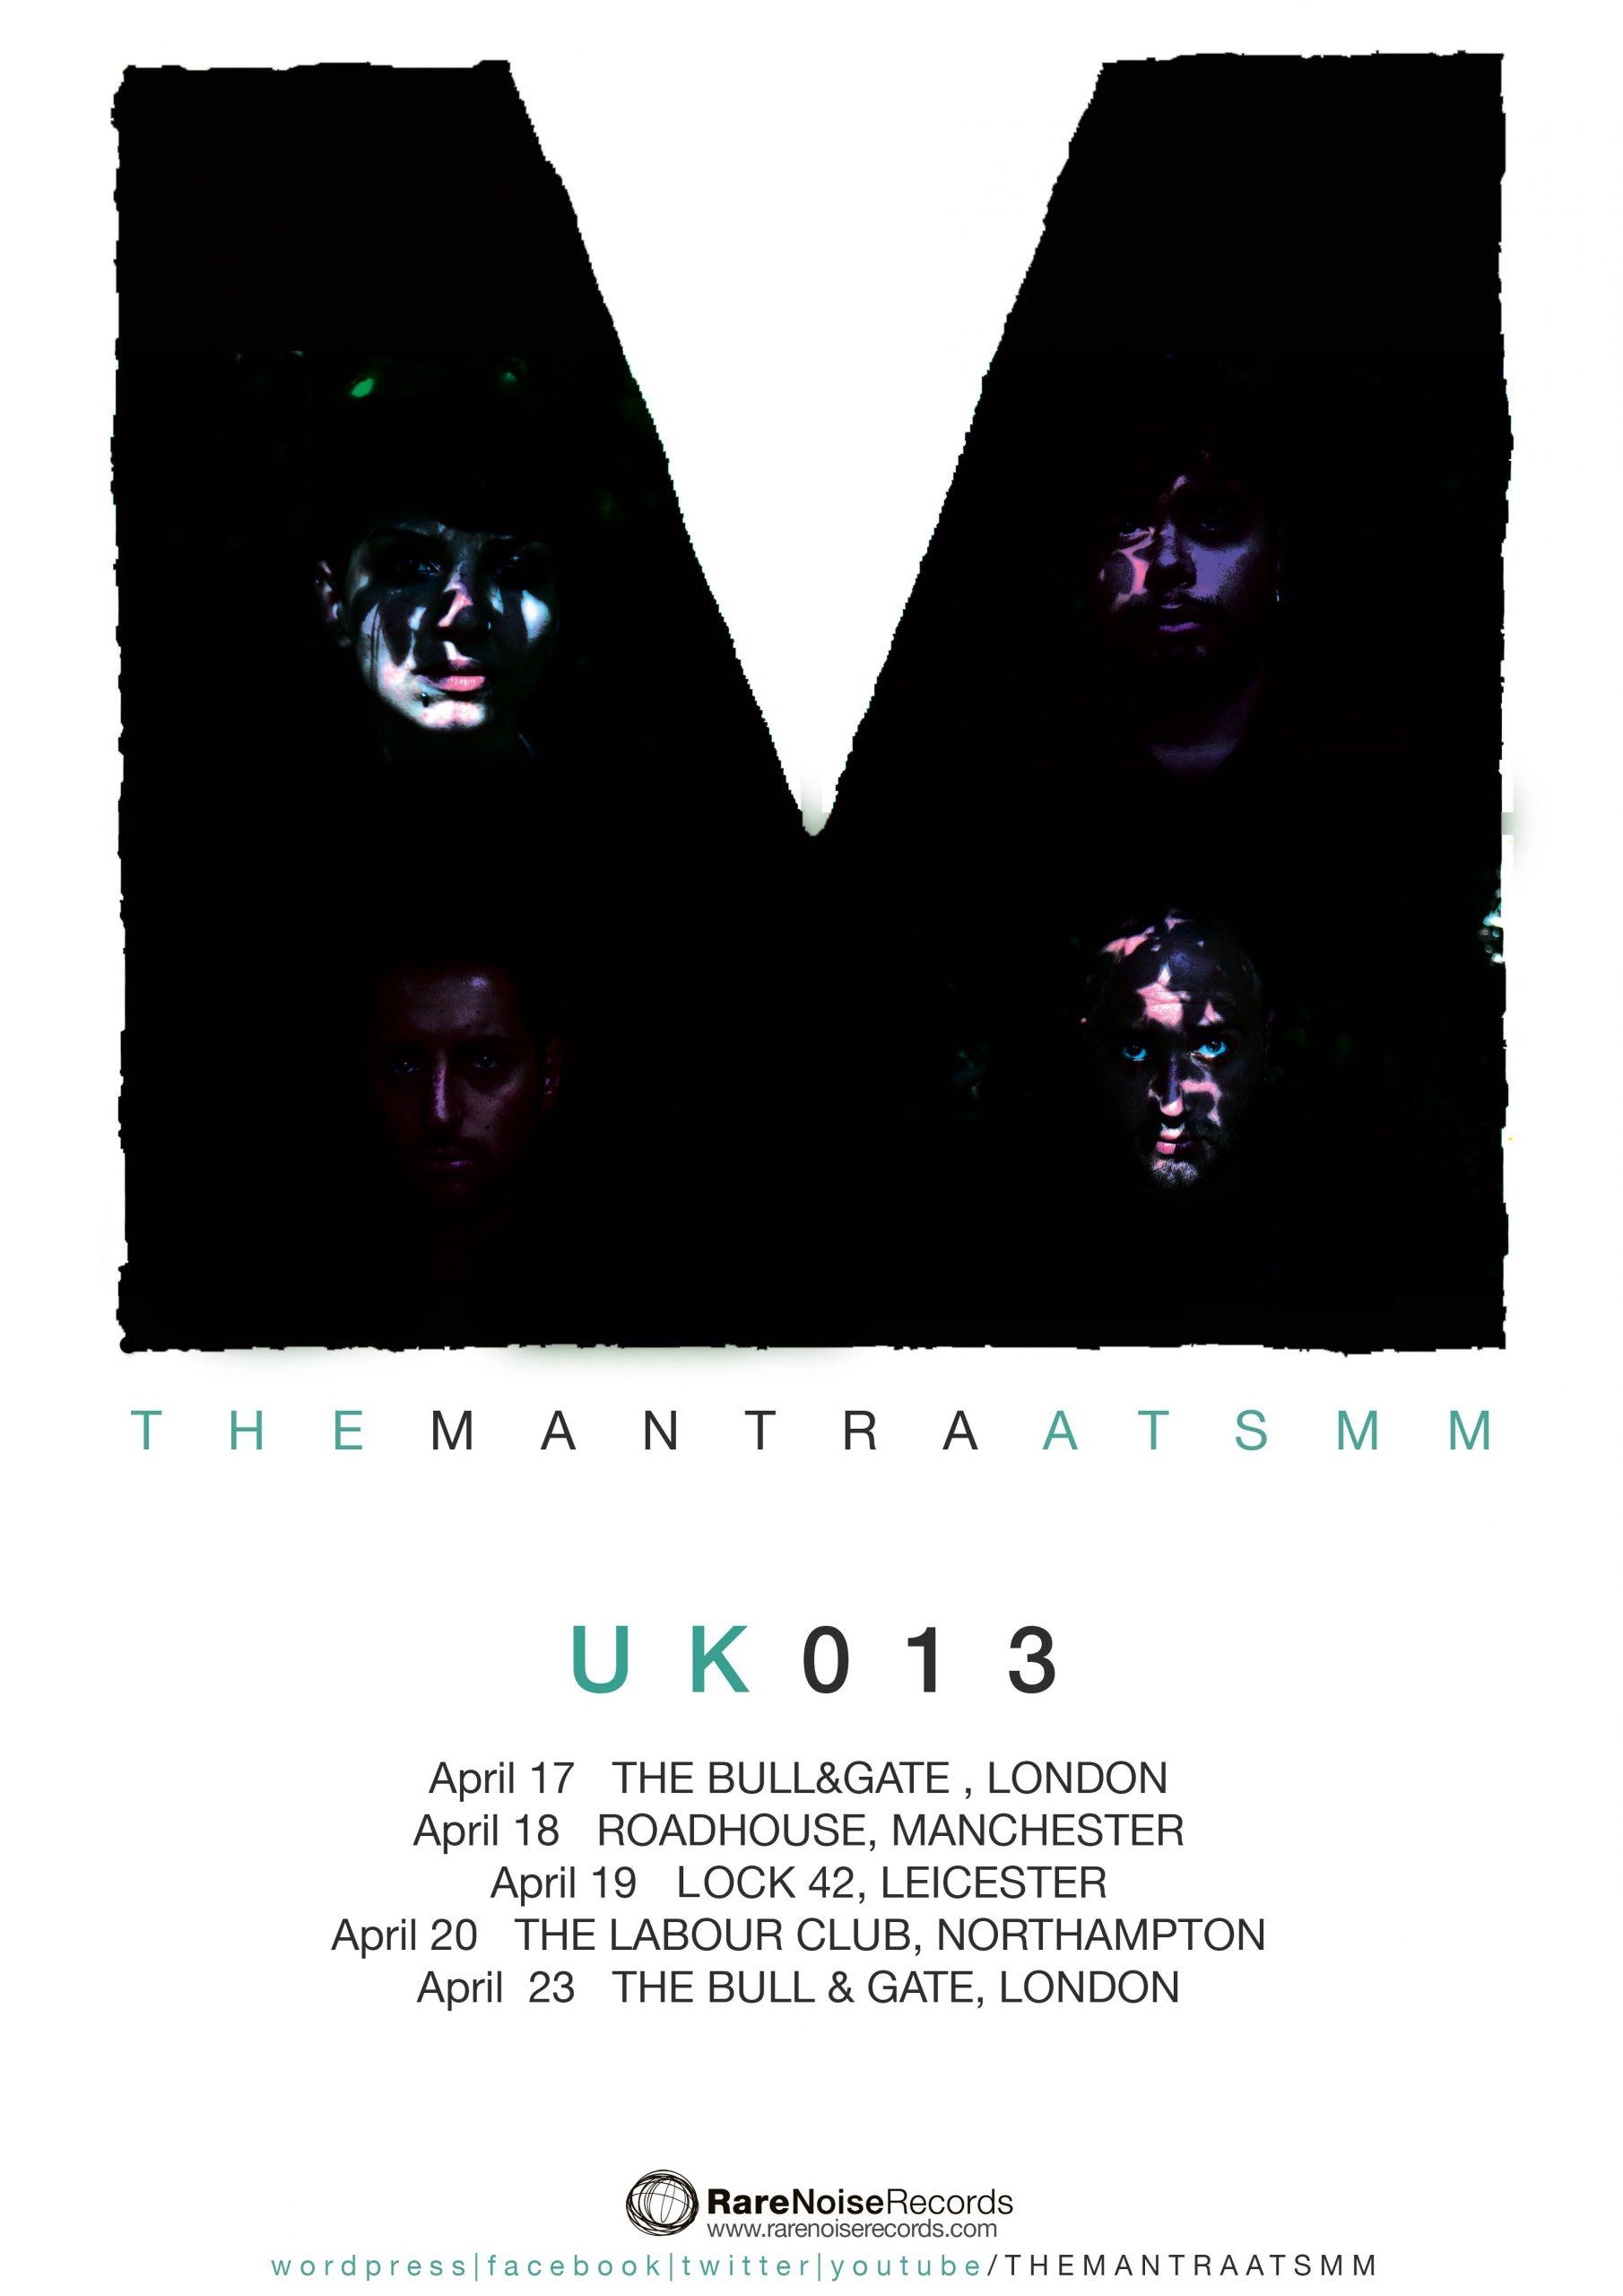 LIVE UPDATES: The Mantra ATSMM UK tour APRIL17 - APRIL 23 1